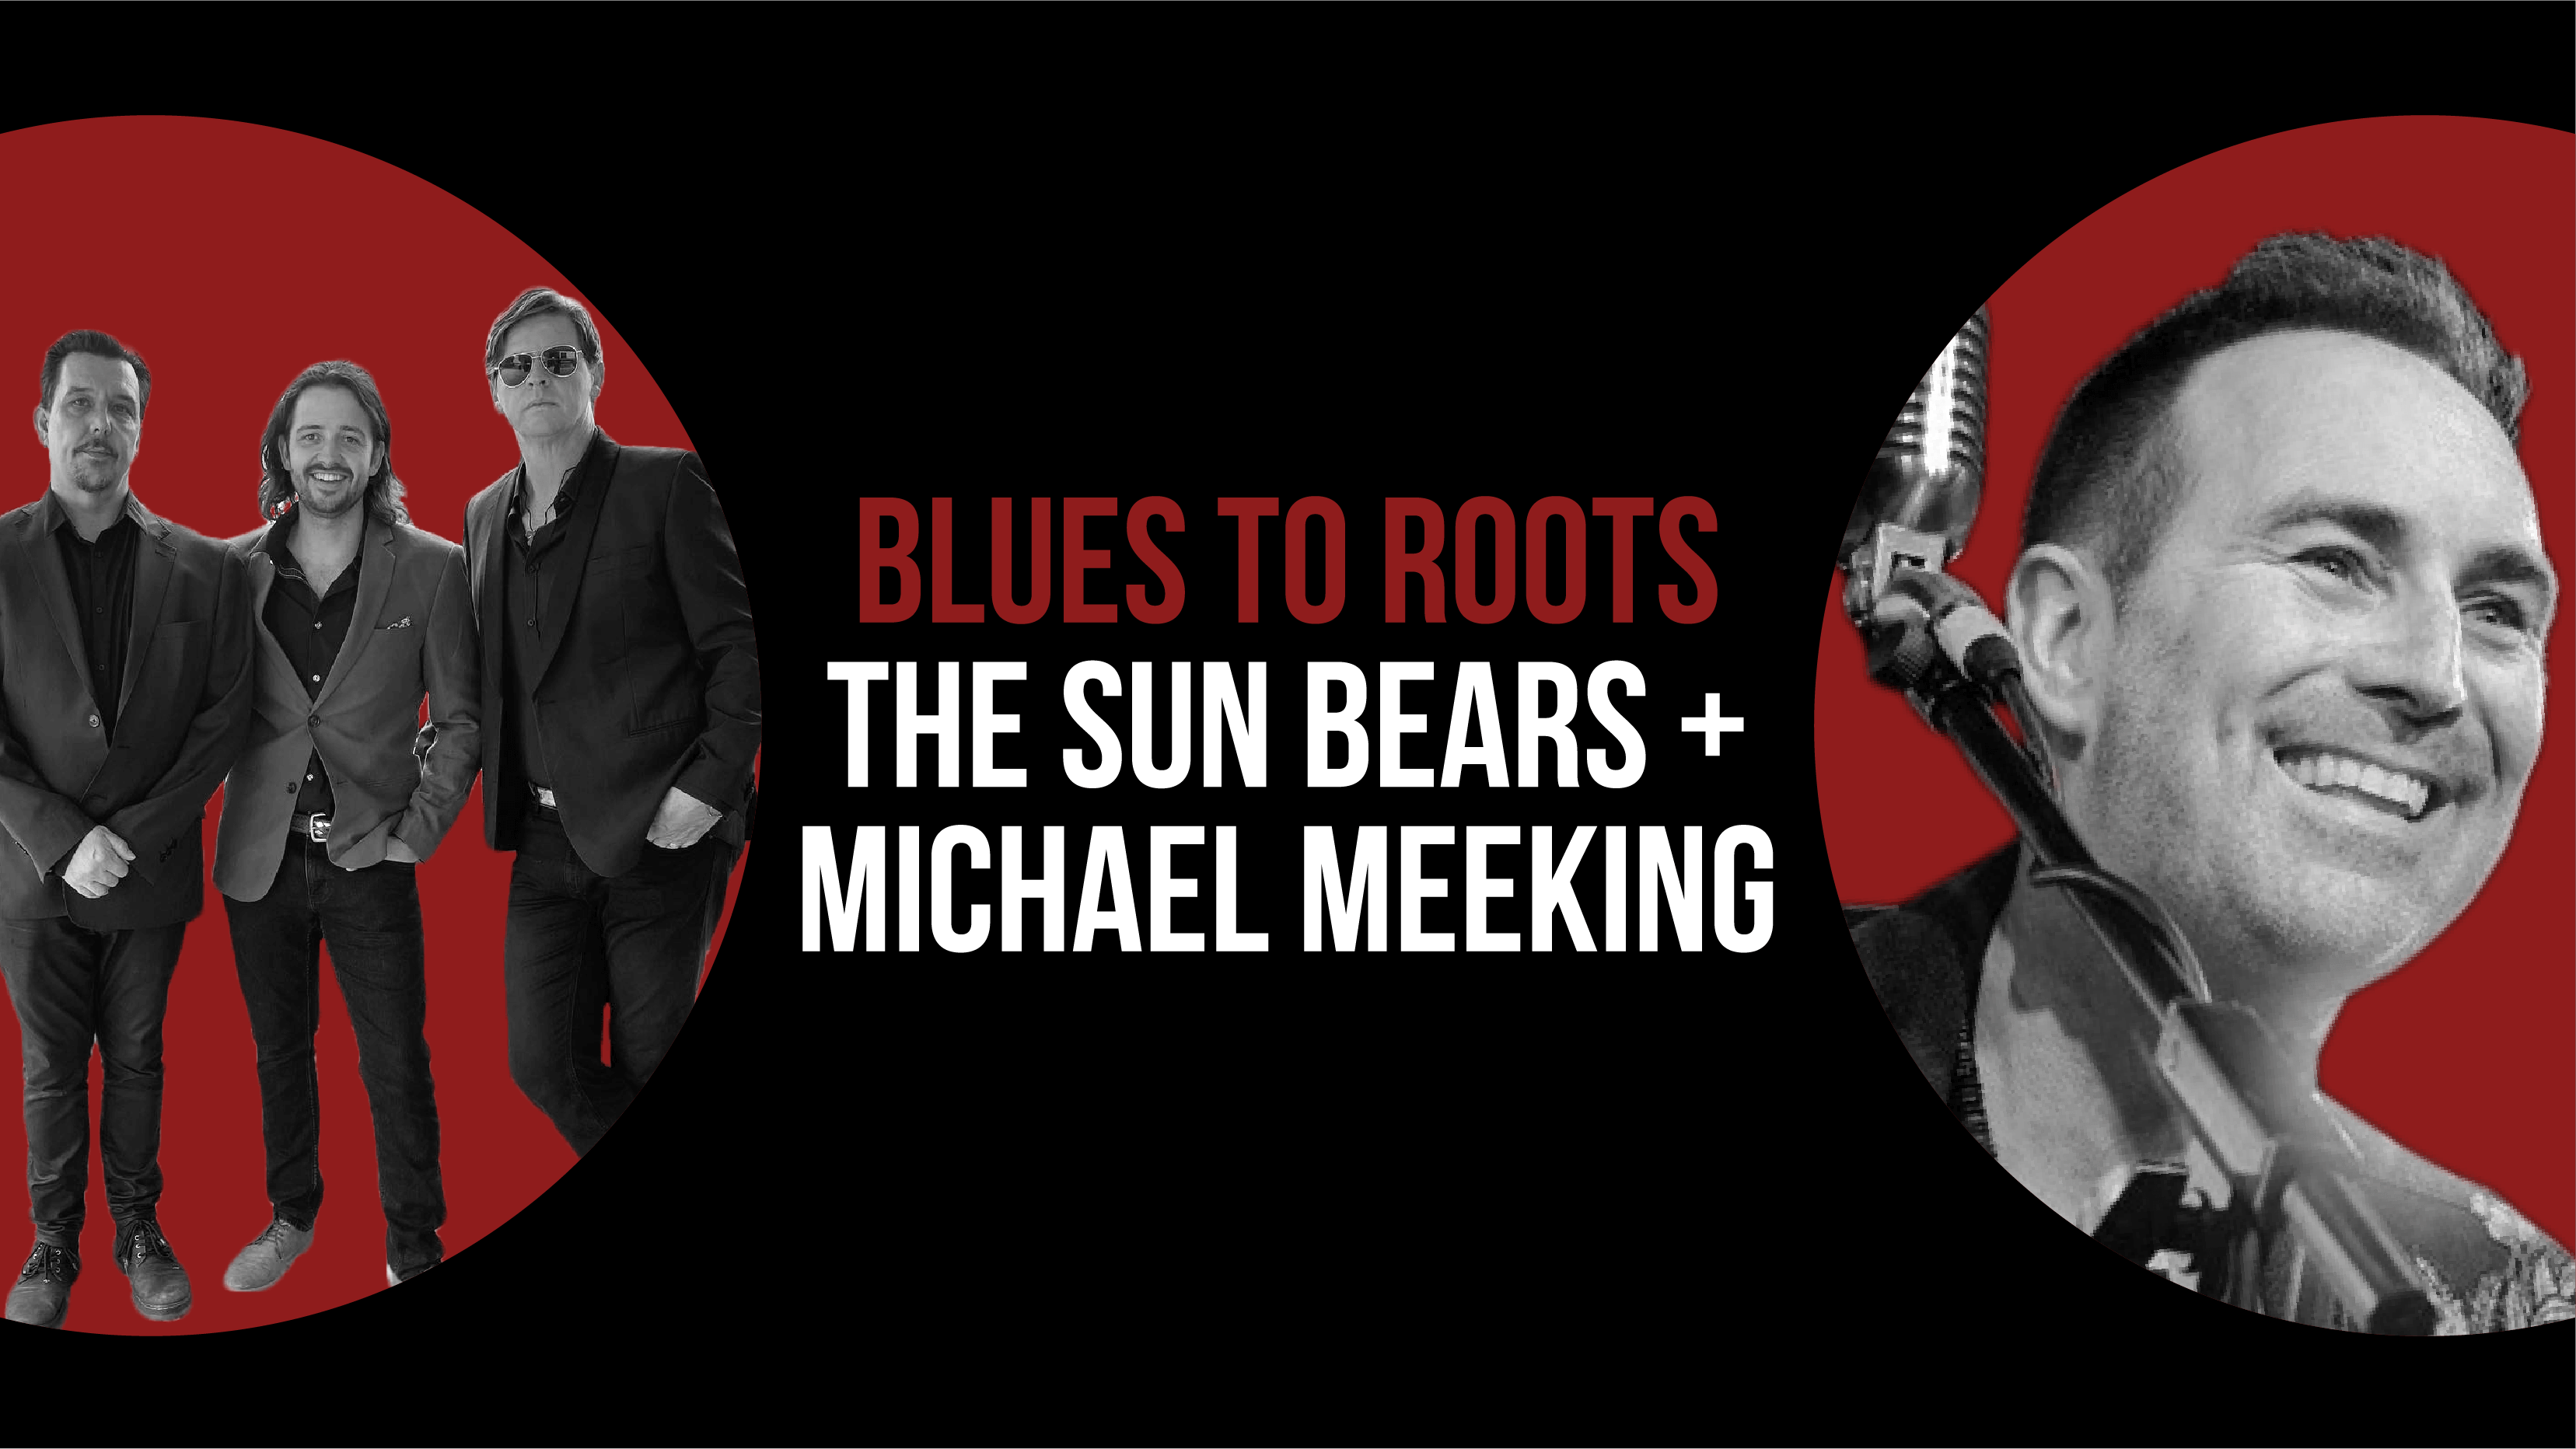 The Sun Bears and Michael Meeking